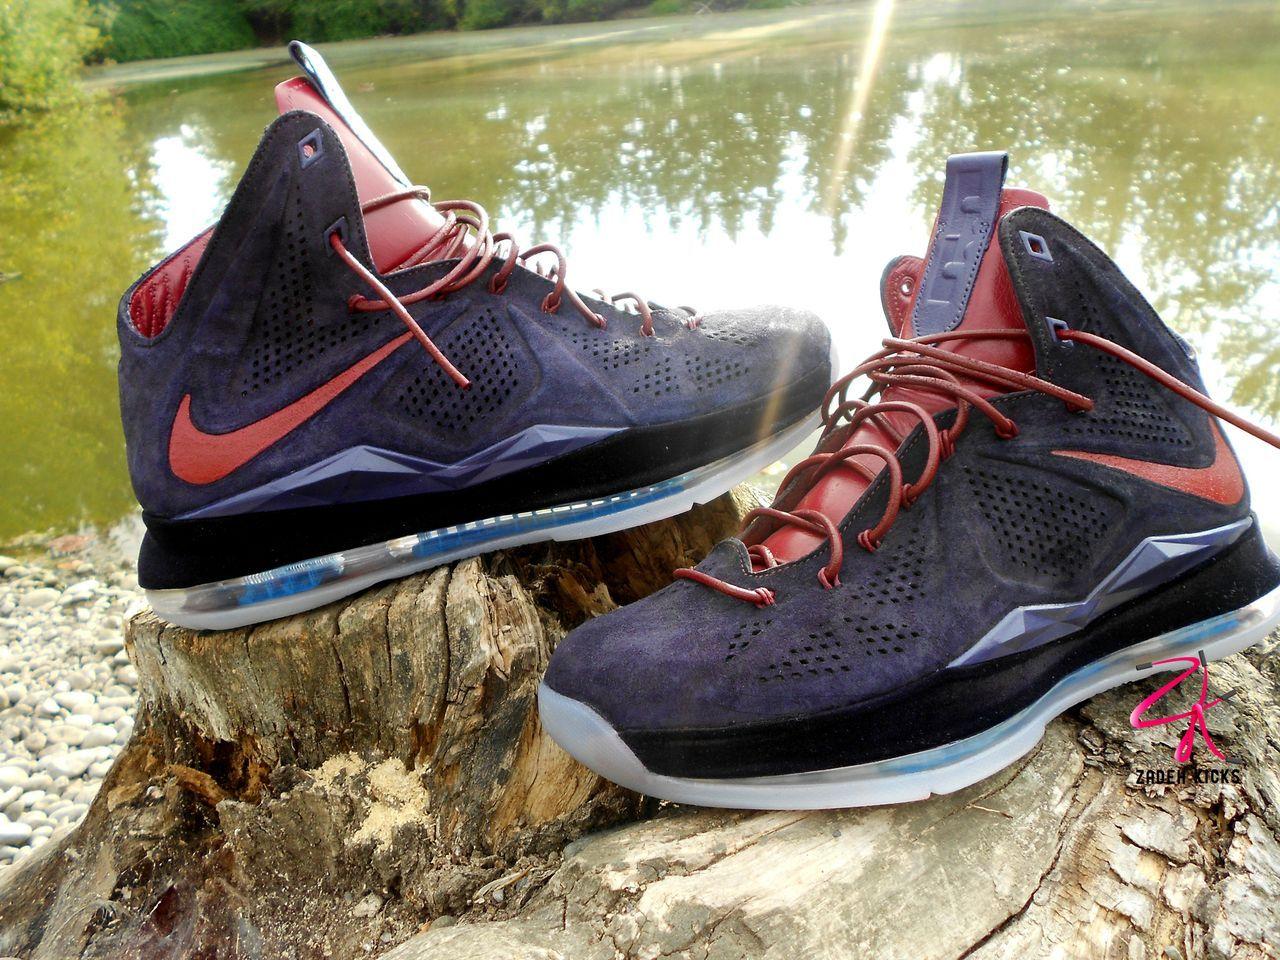 9c23d2686a6 plum lebron ext customs 10 Nike LeBron X EXT Plum Customs by Zadeh Kicks